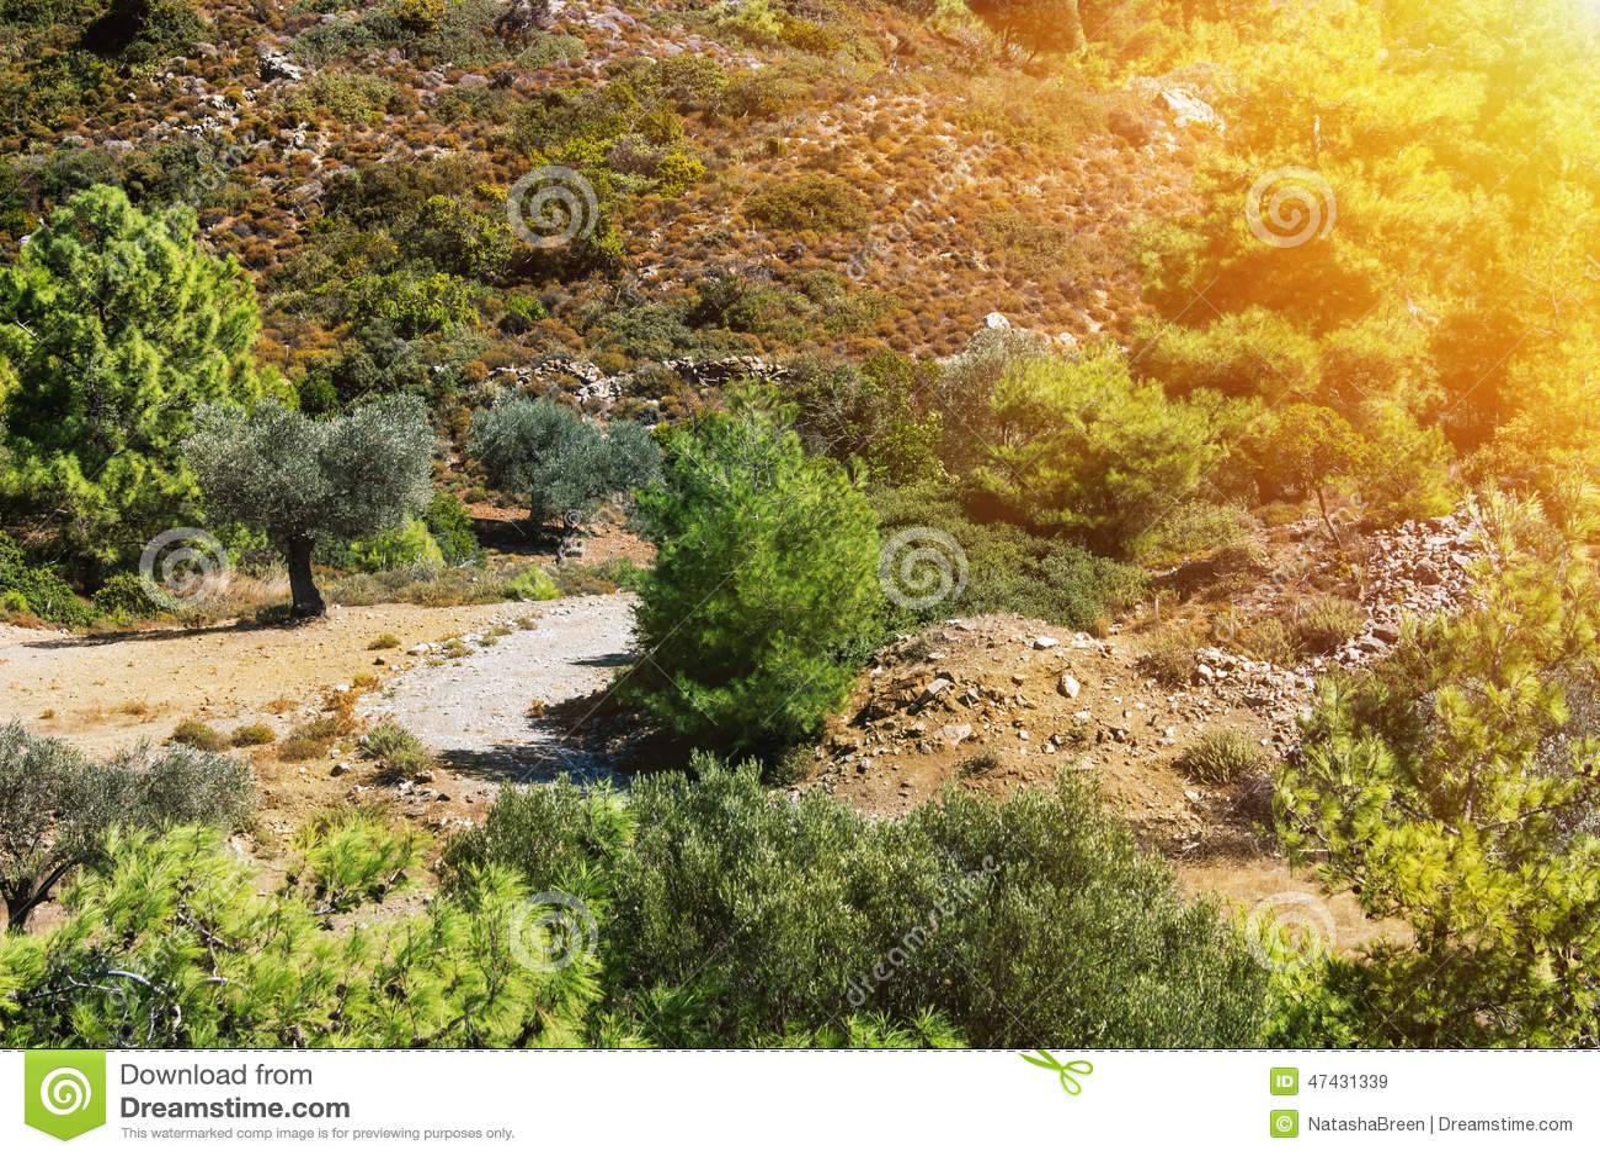 Greece Landscape Stock Photo - Image: 47431339